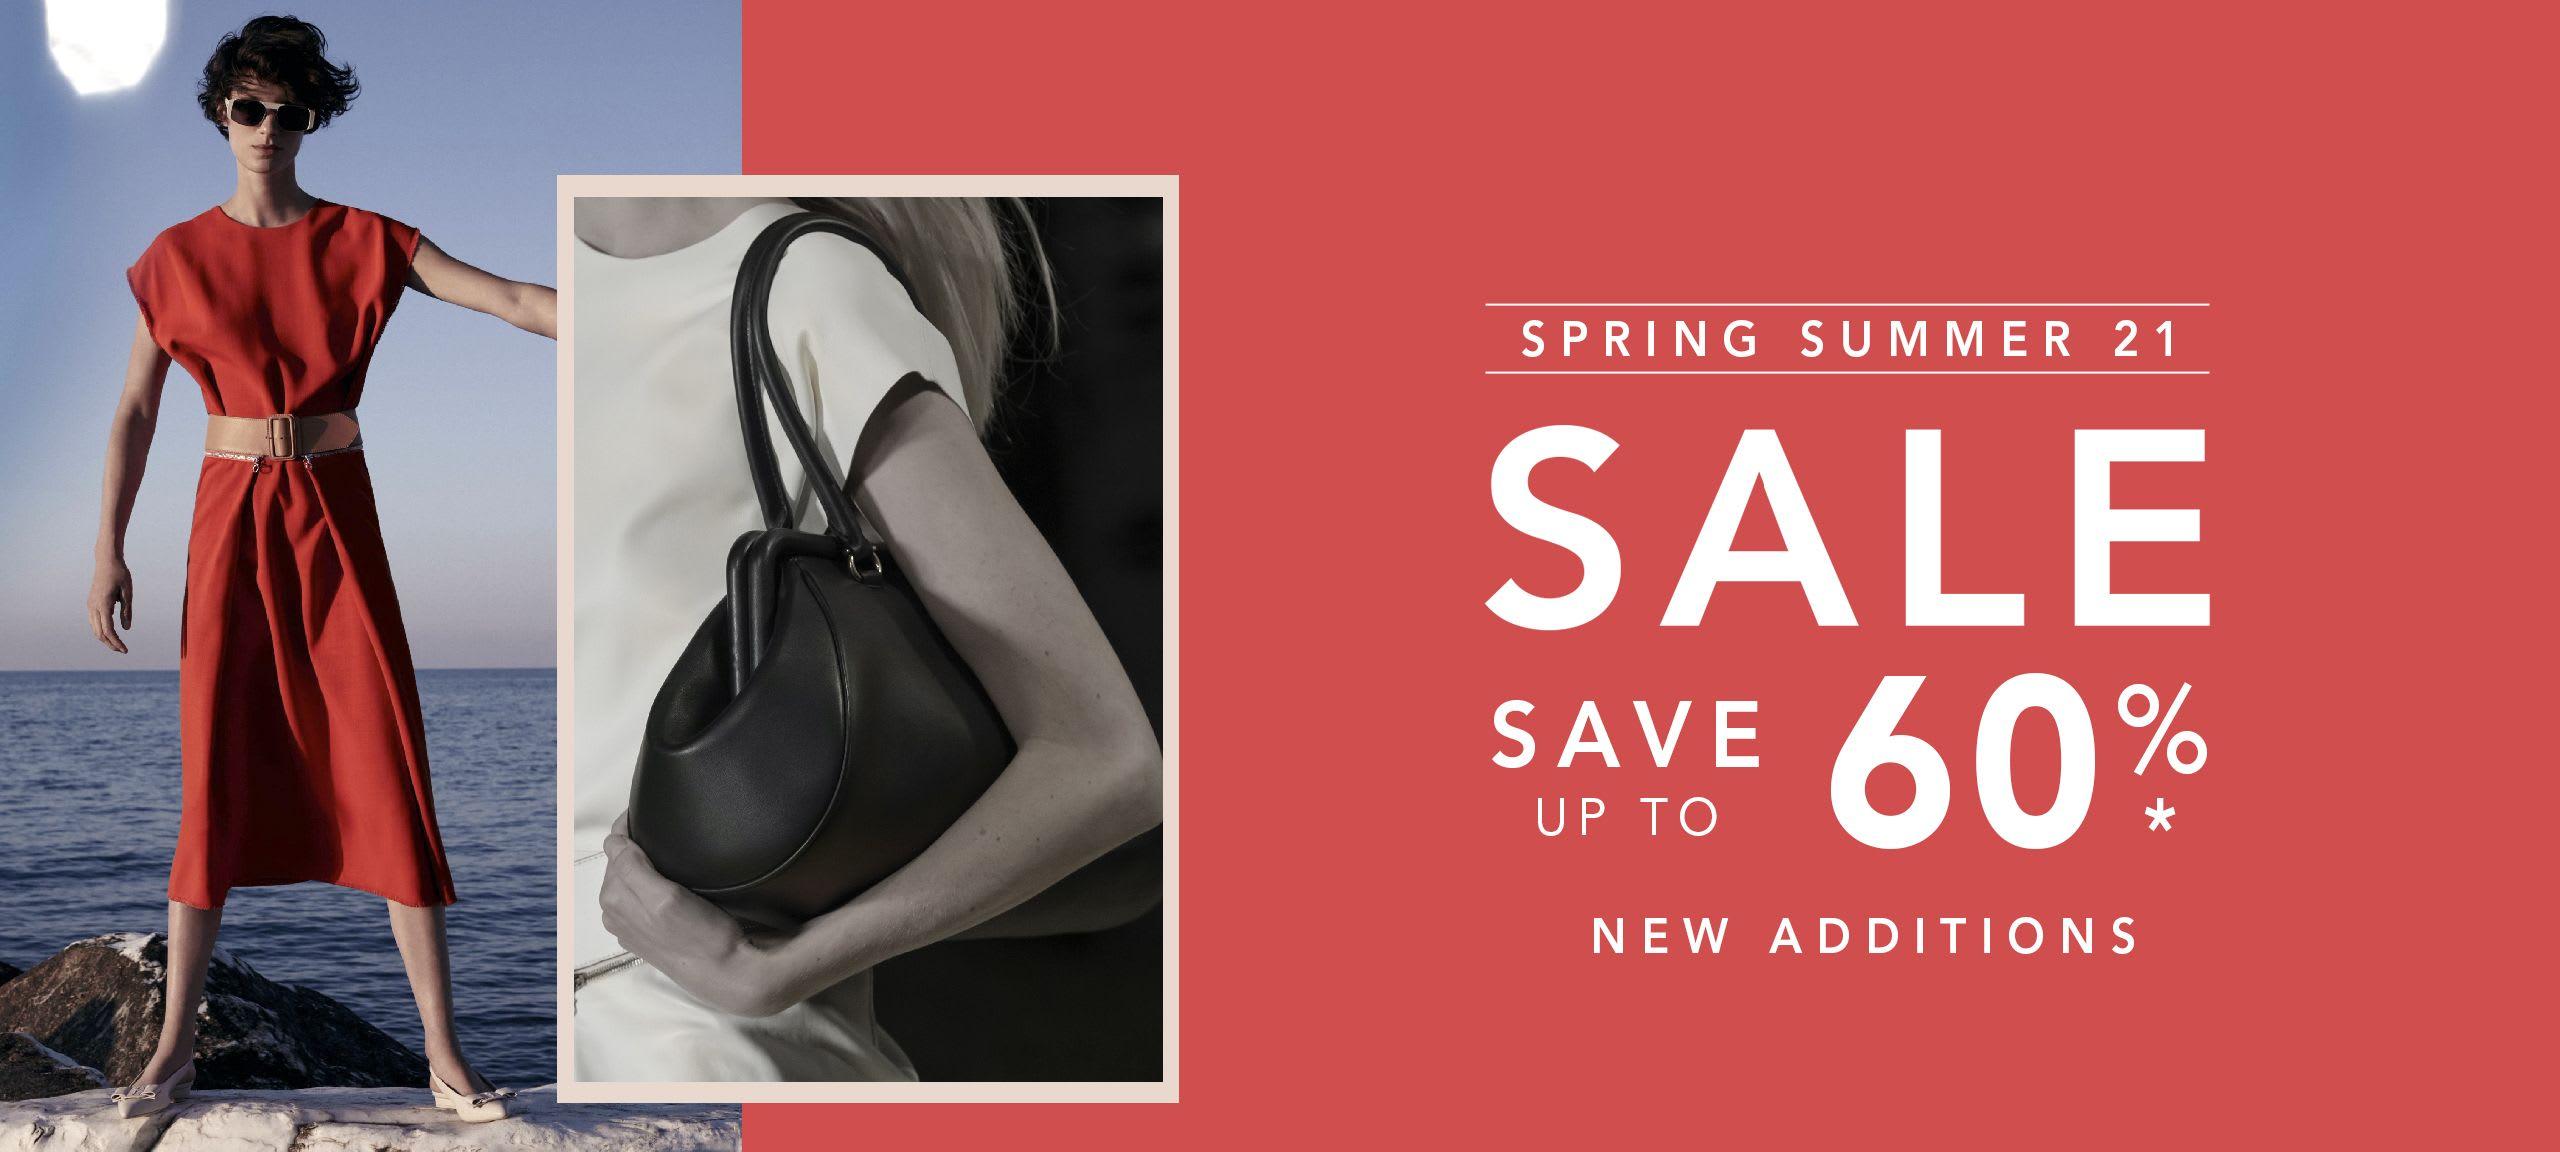 Women Spring Summer 21 Sale by italist